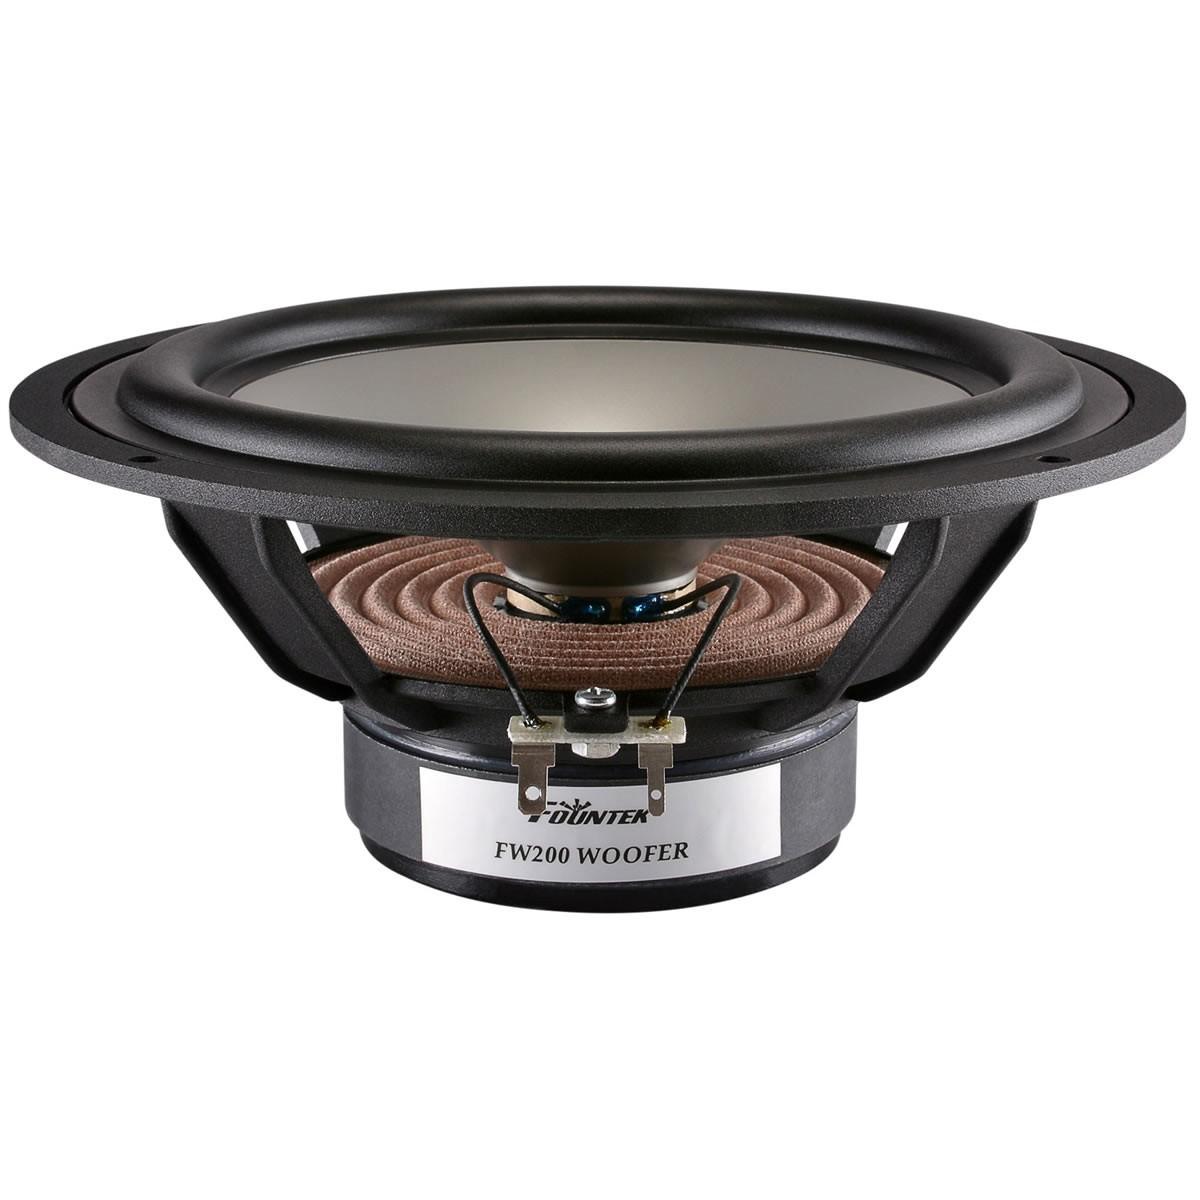 FOUNTEK FW200 Loudspeaker Woofer 8 Ohm Ø20cm